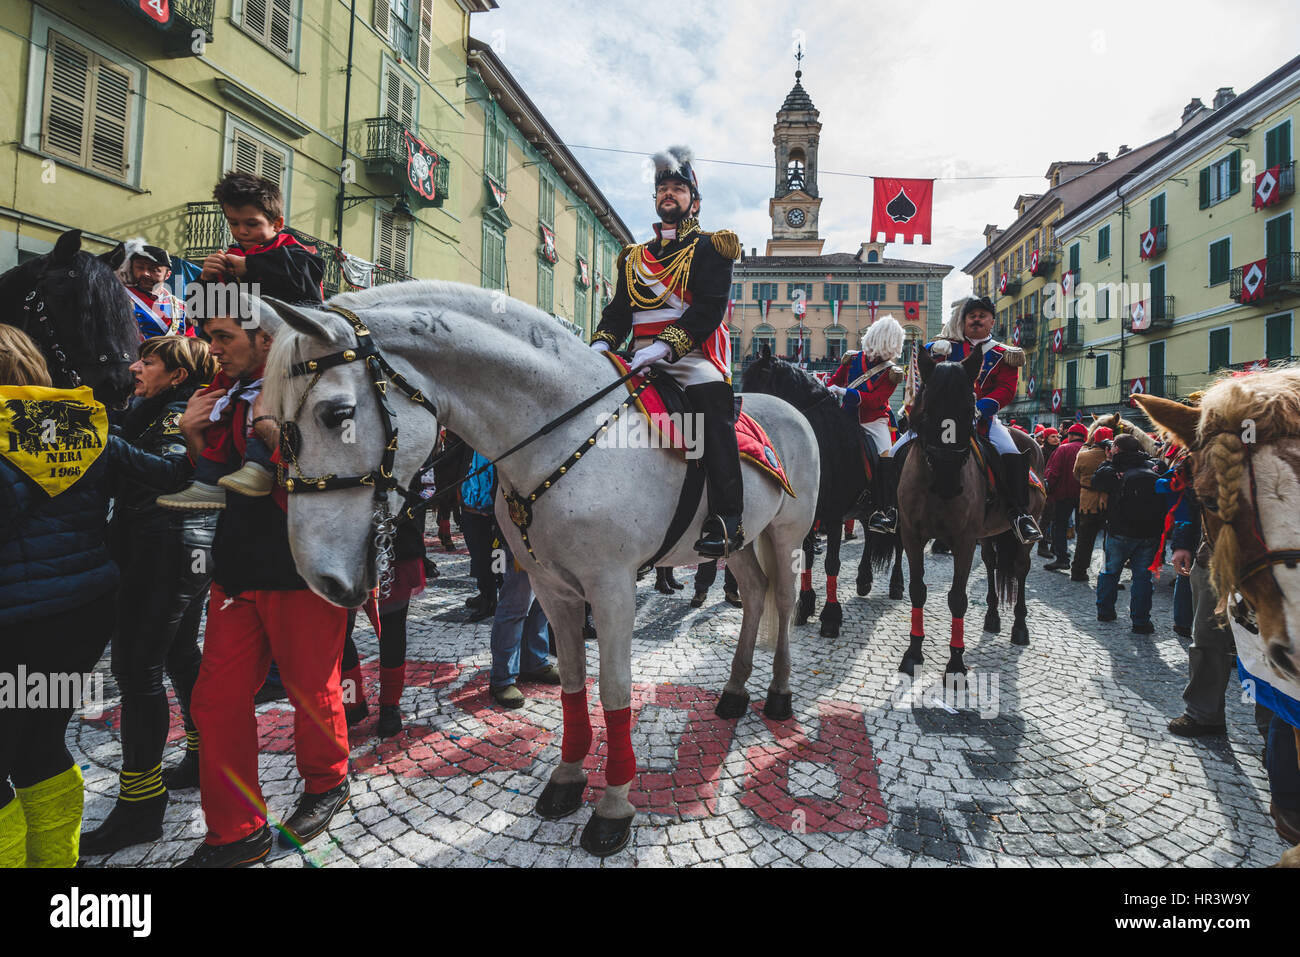 Ivrea, Italy. 26th Feb, 2017. February 26, 2017: The Historical Carnival of Ivrea and the Orange Battle Photo: Cronos/Alessandro Stock Photo